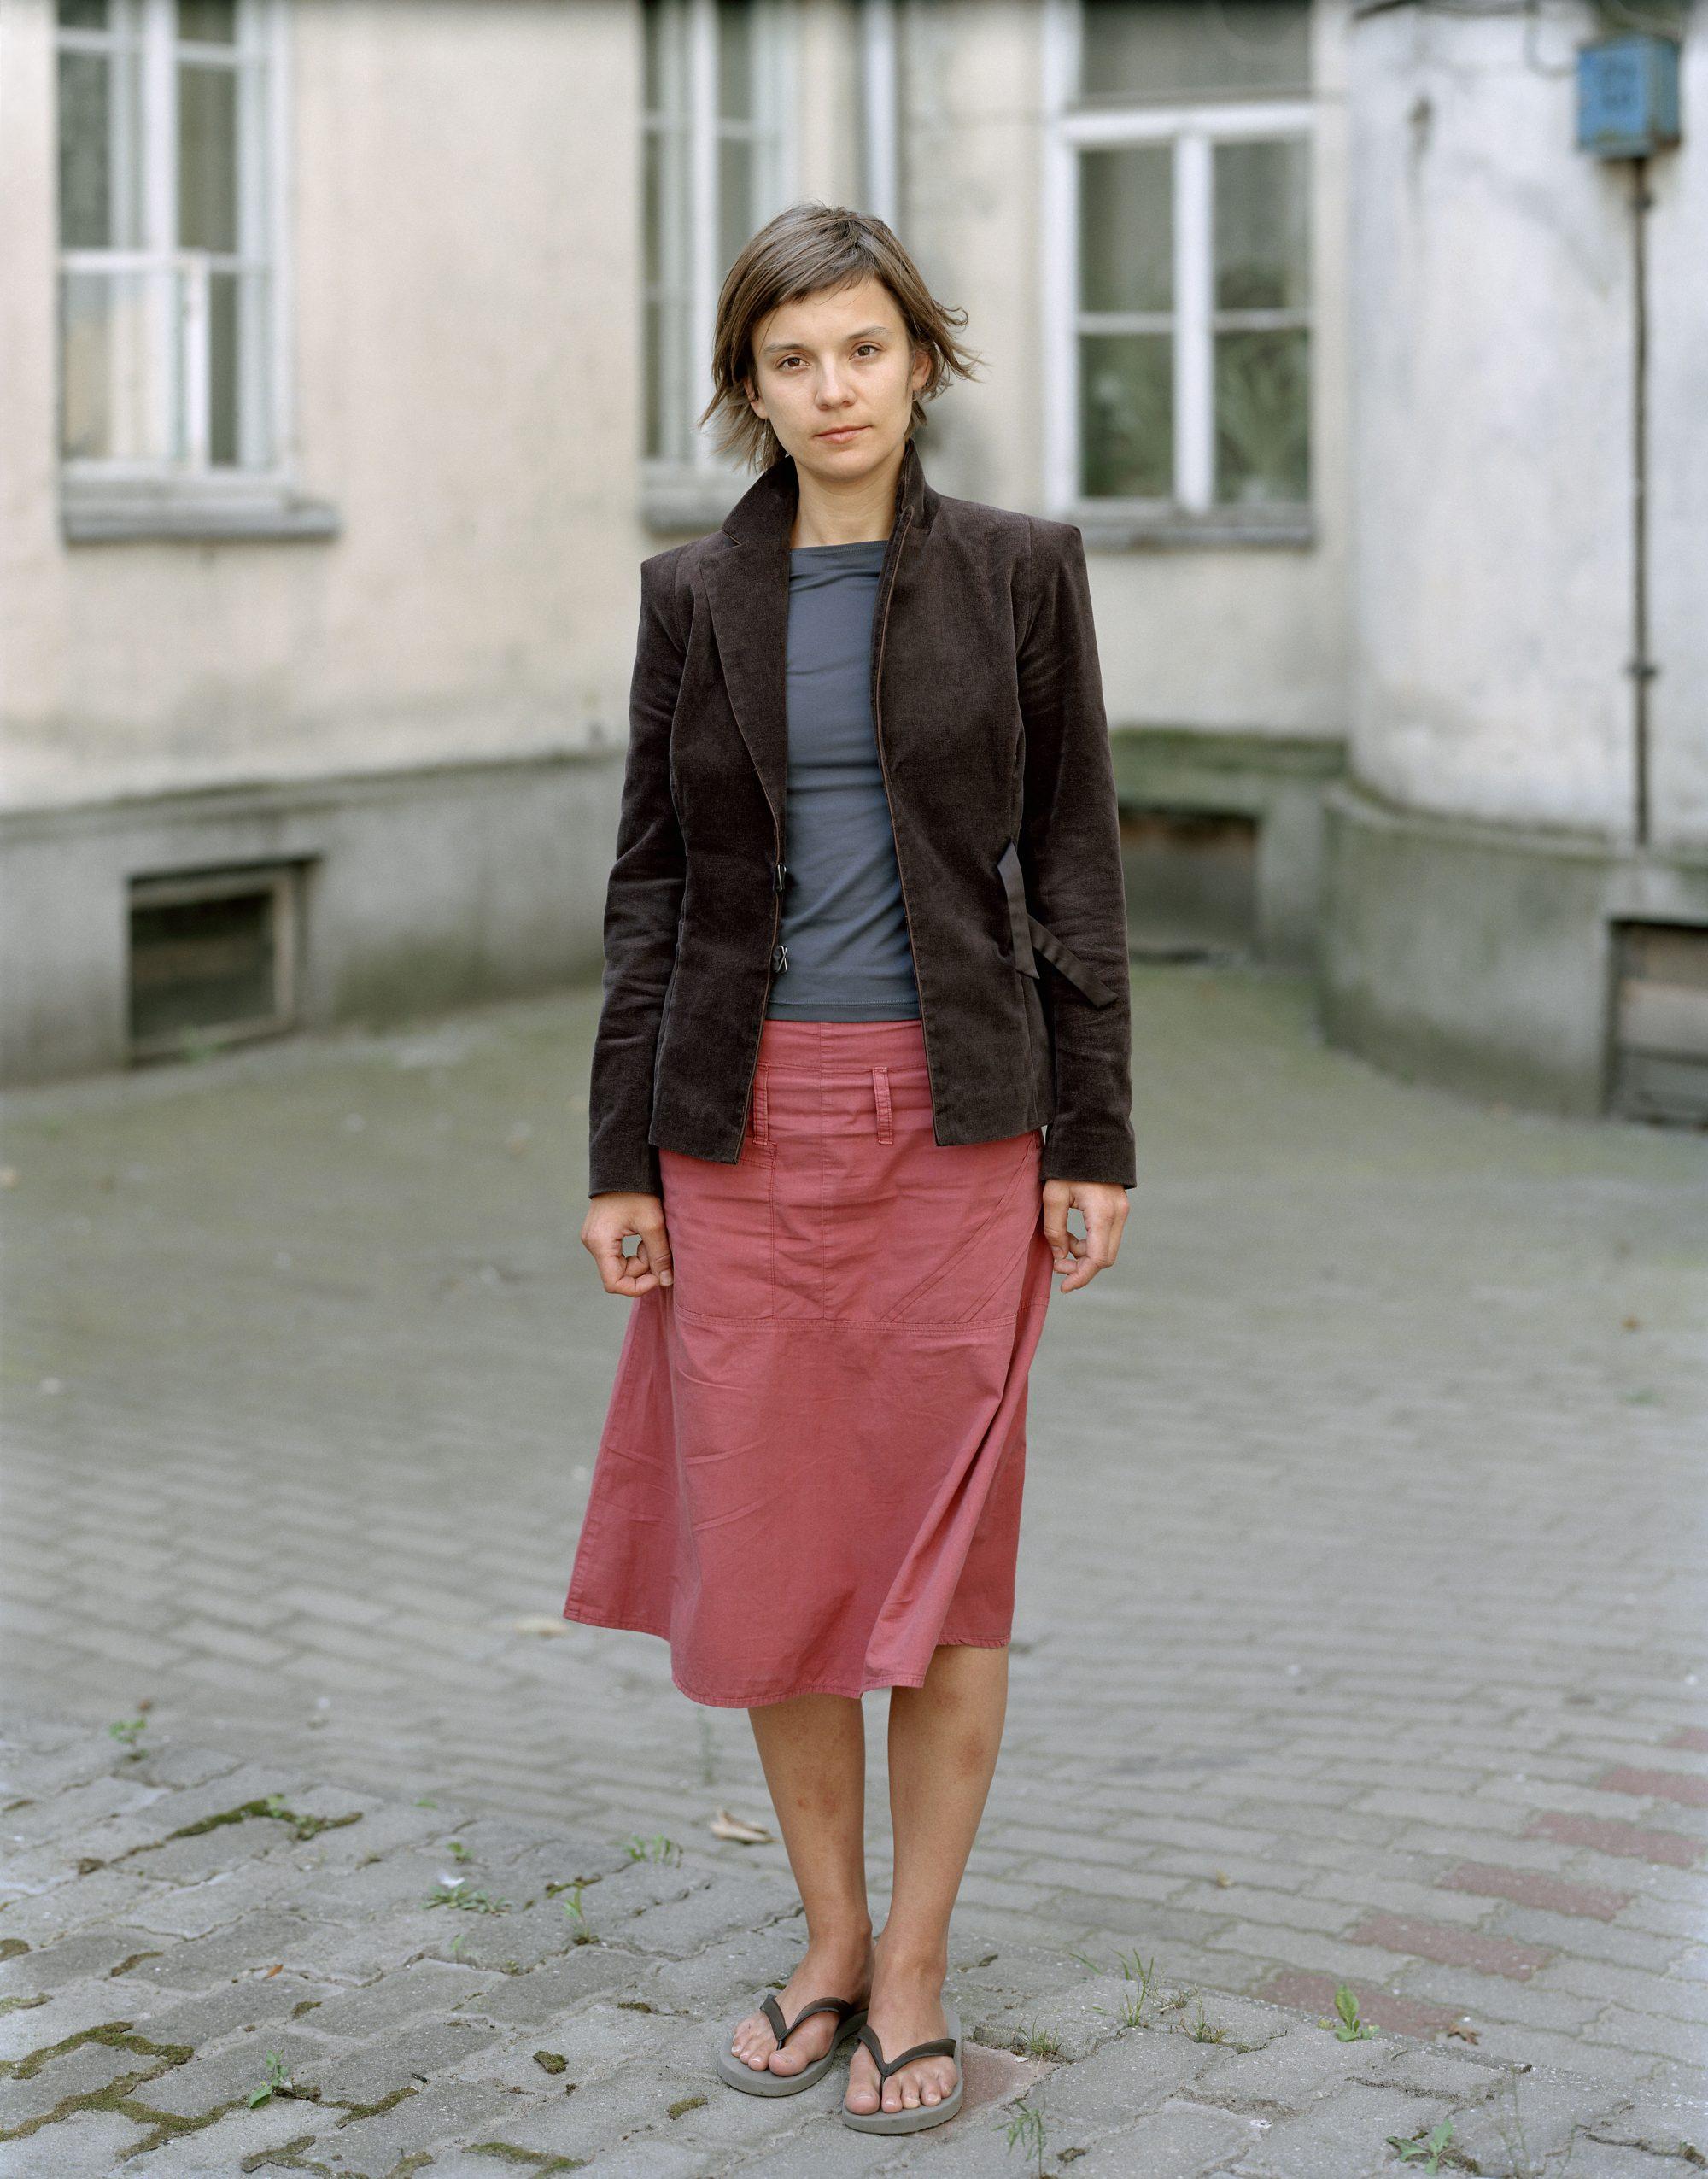 Magda. Warsaw, Poland. September 2004 © Mark Power/ Magnum Photos